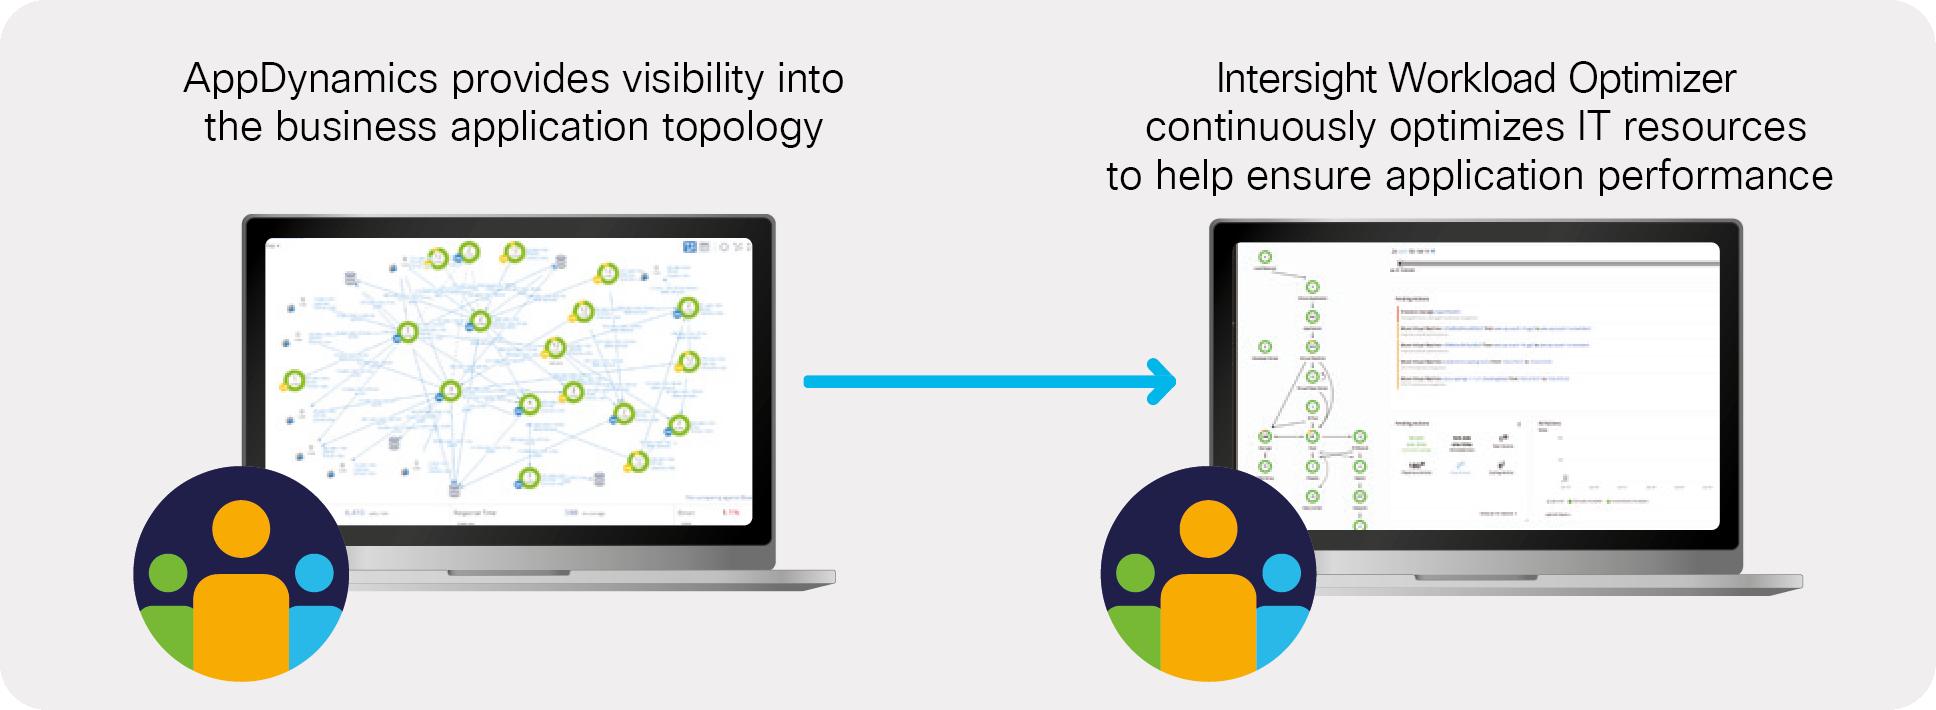 Intersight Workload Optimizer Full Stack